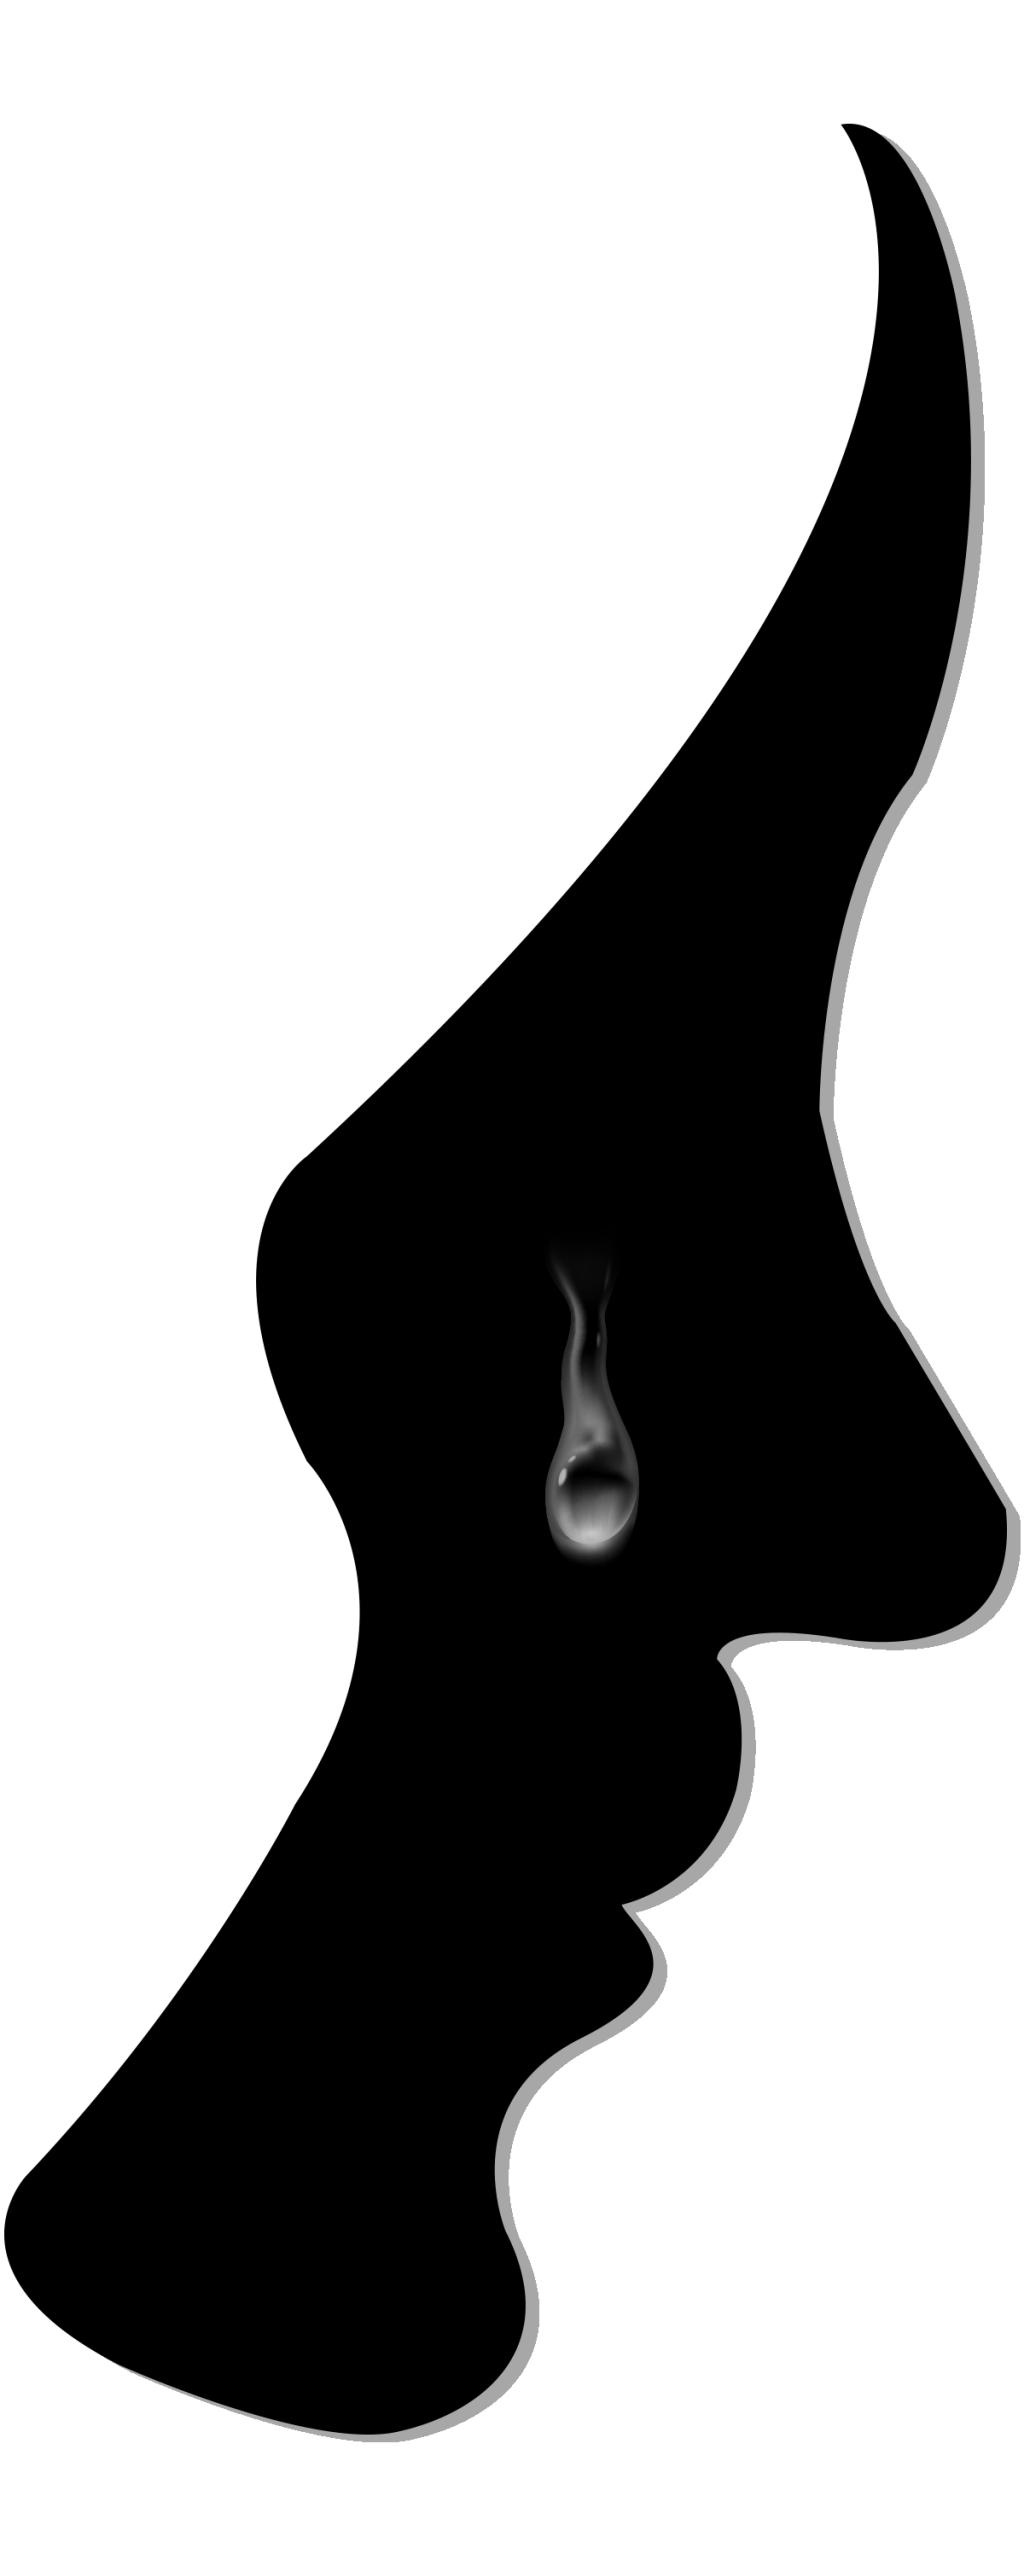 Rape spotlight shines on FAMU.